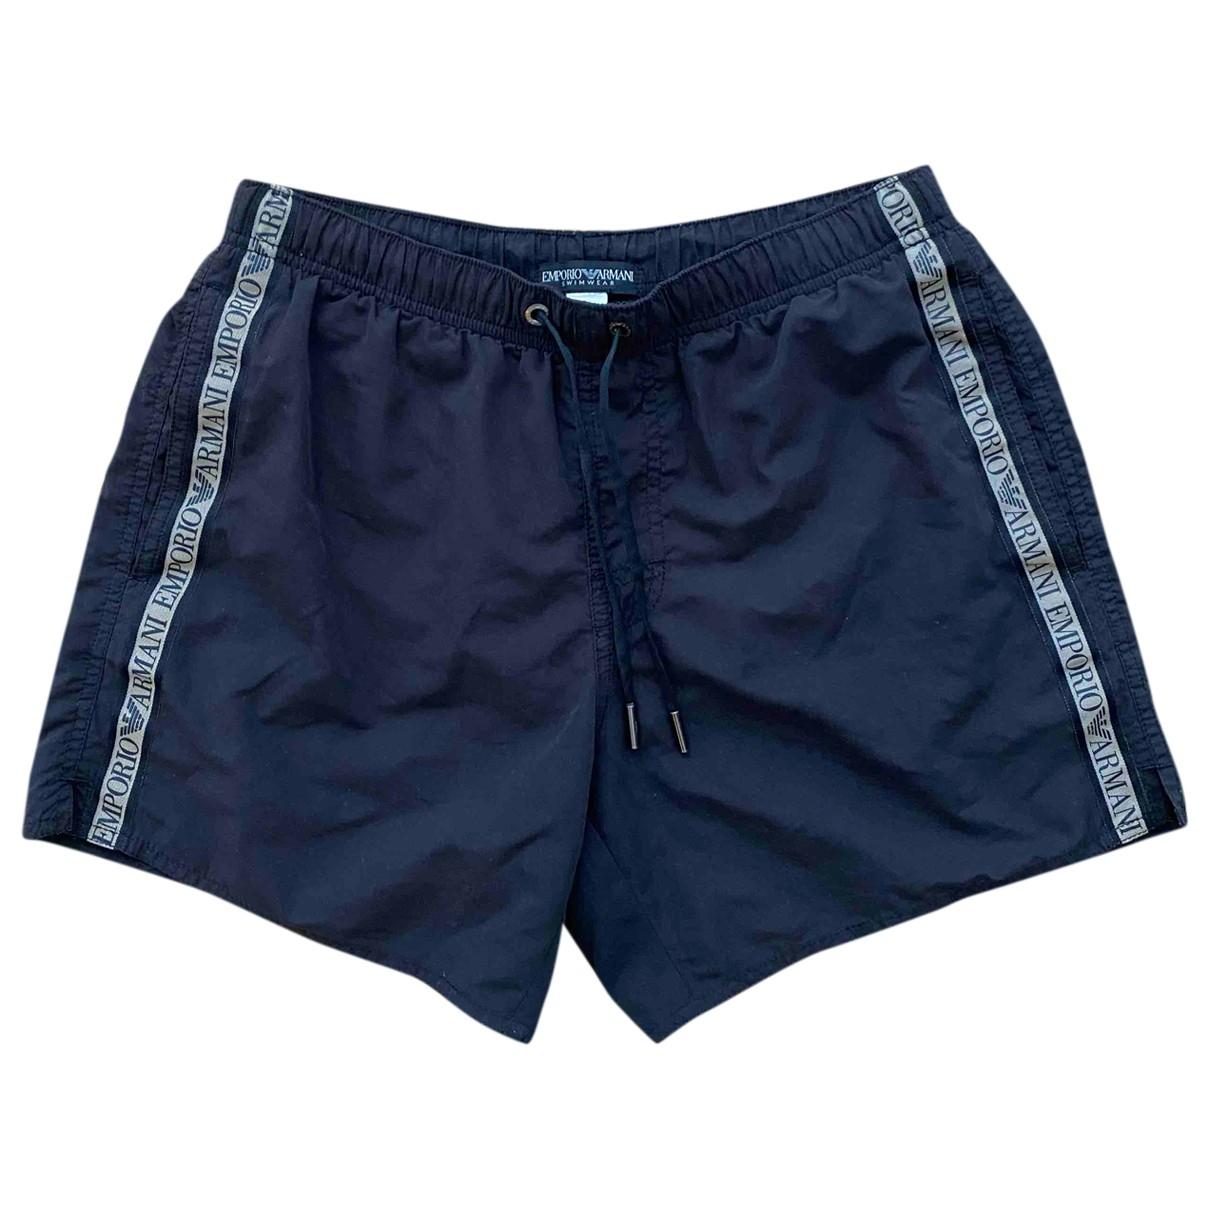 Emporio Armani N Black Swimwear for Men S International